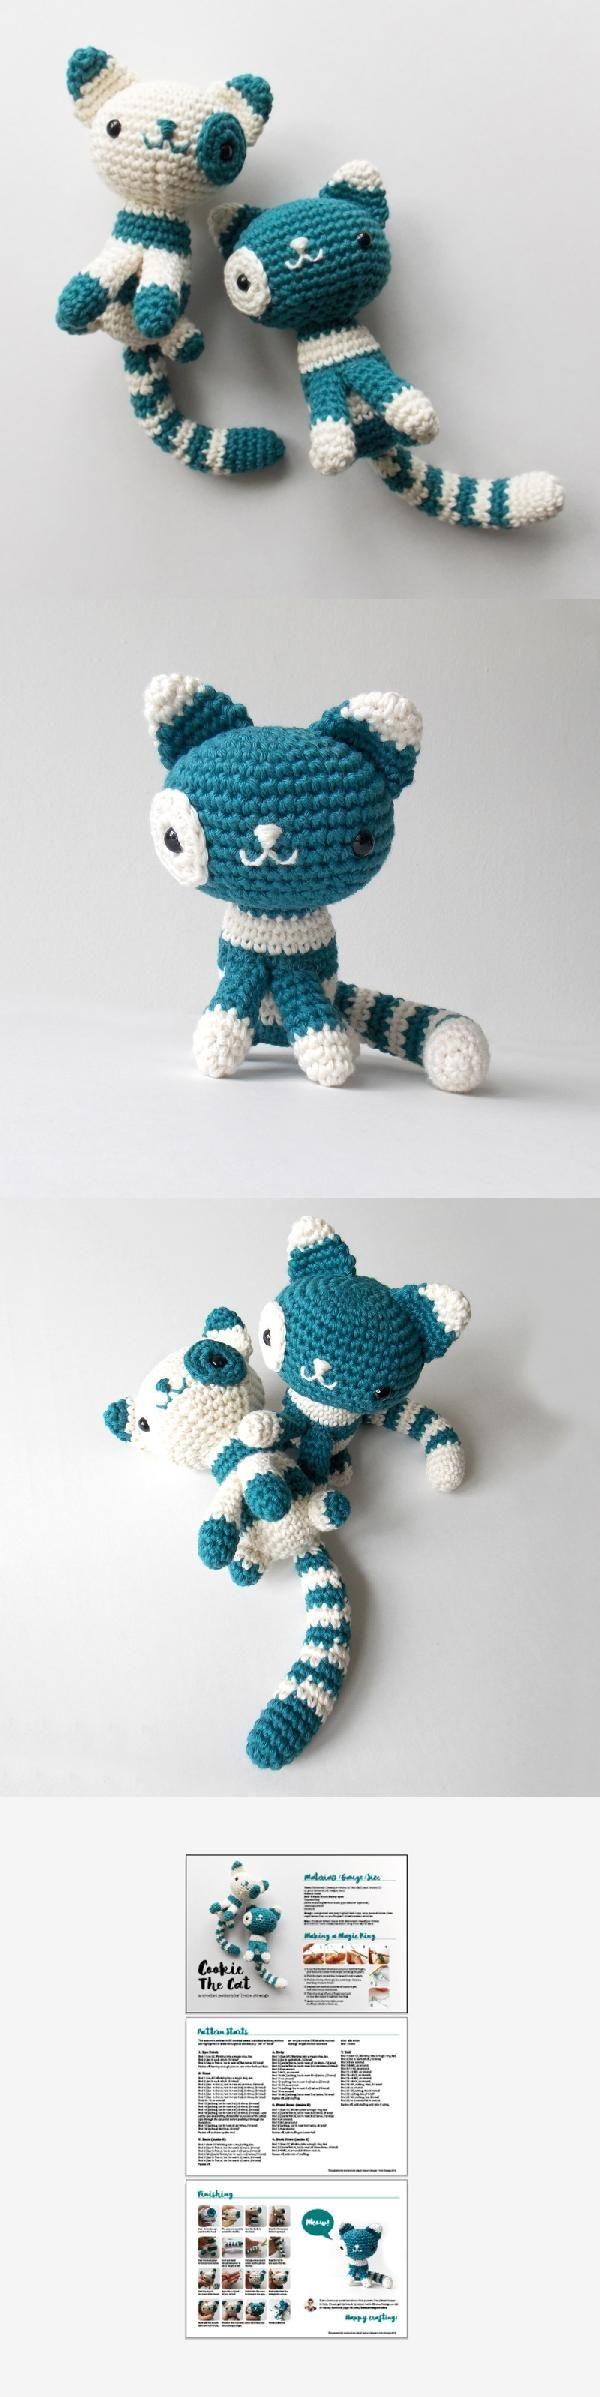 Cookie The Cat amigurumi pattern